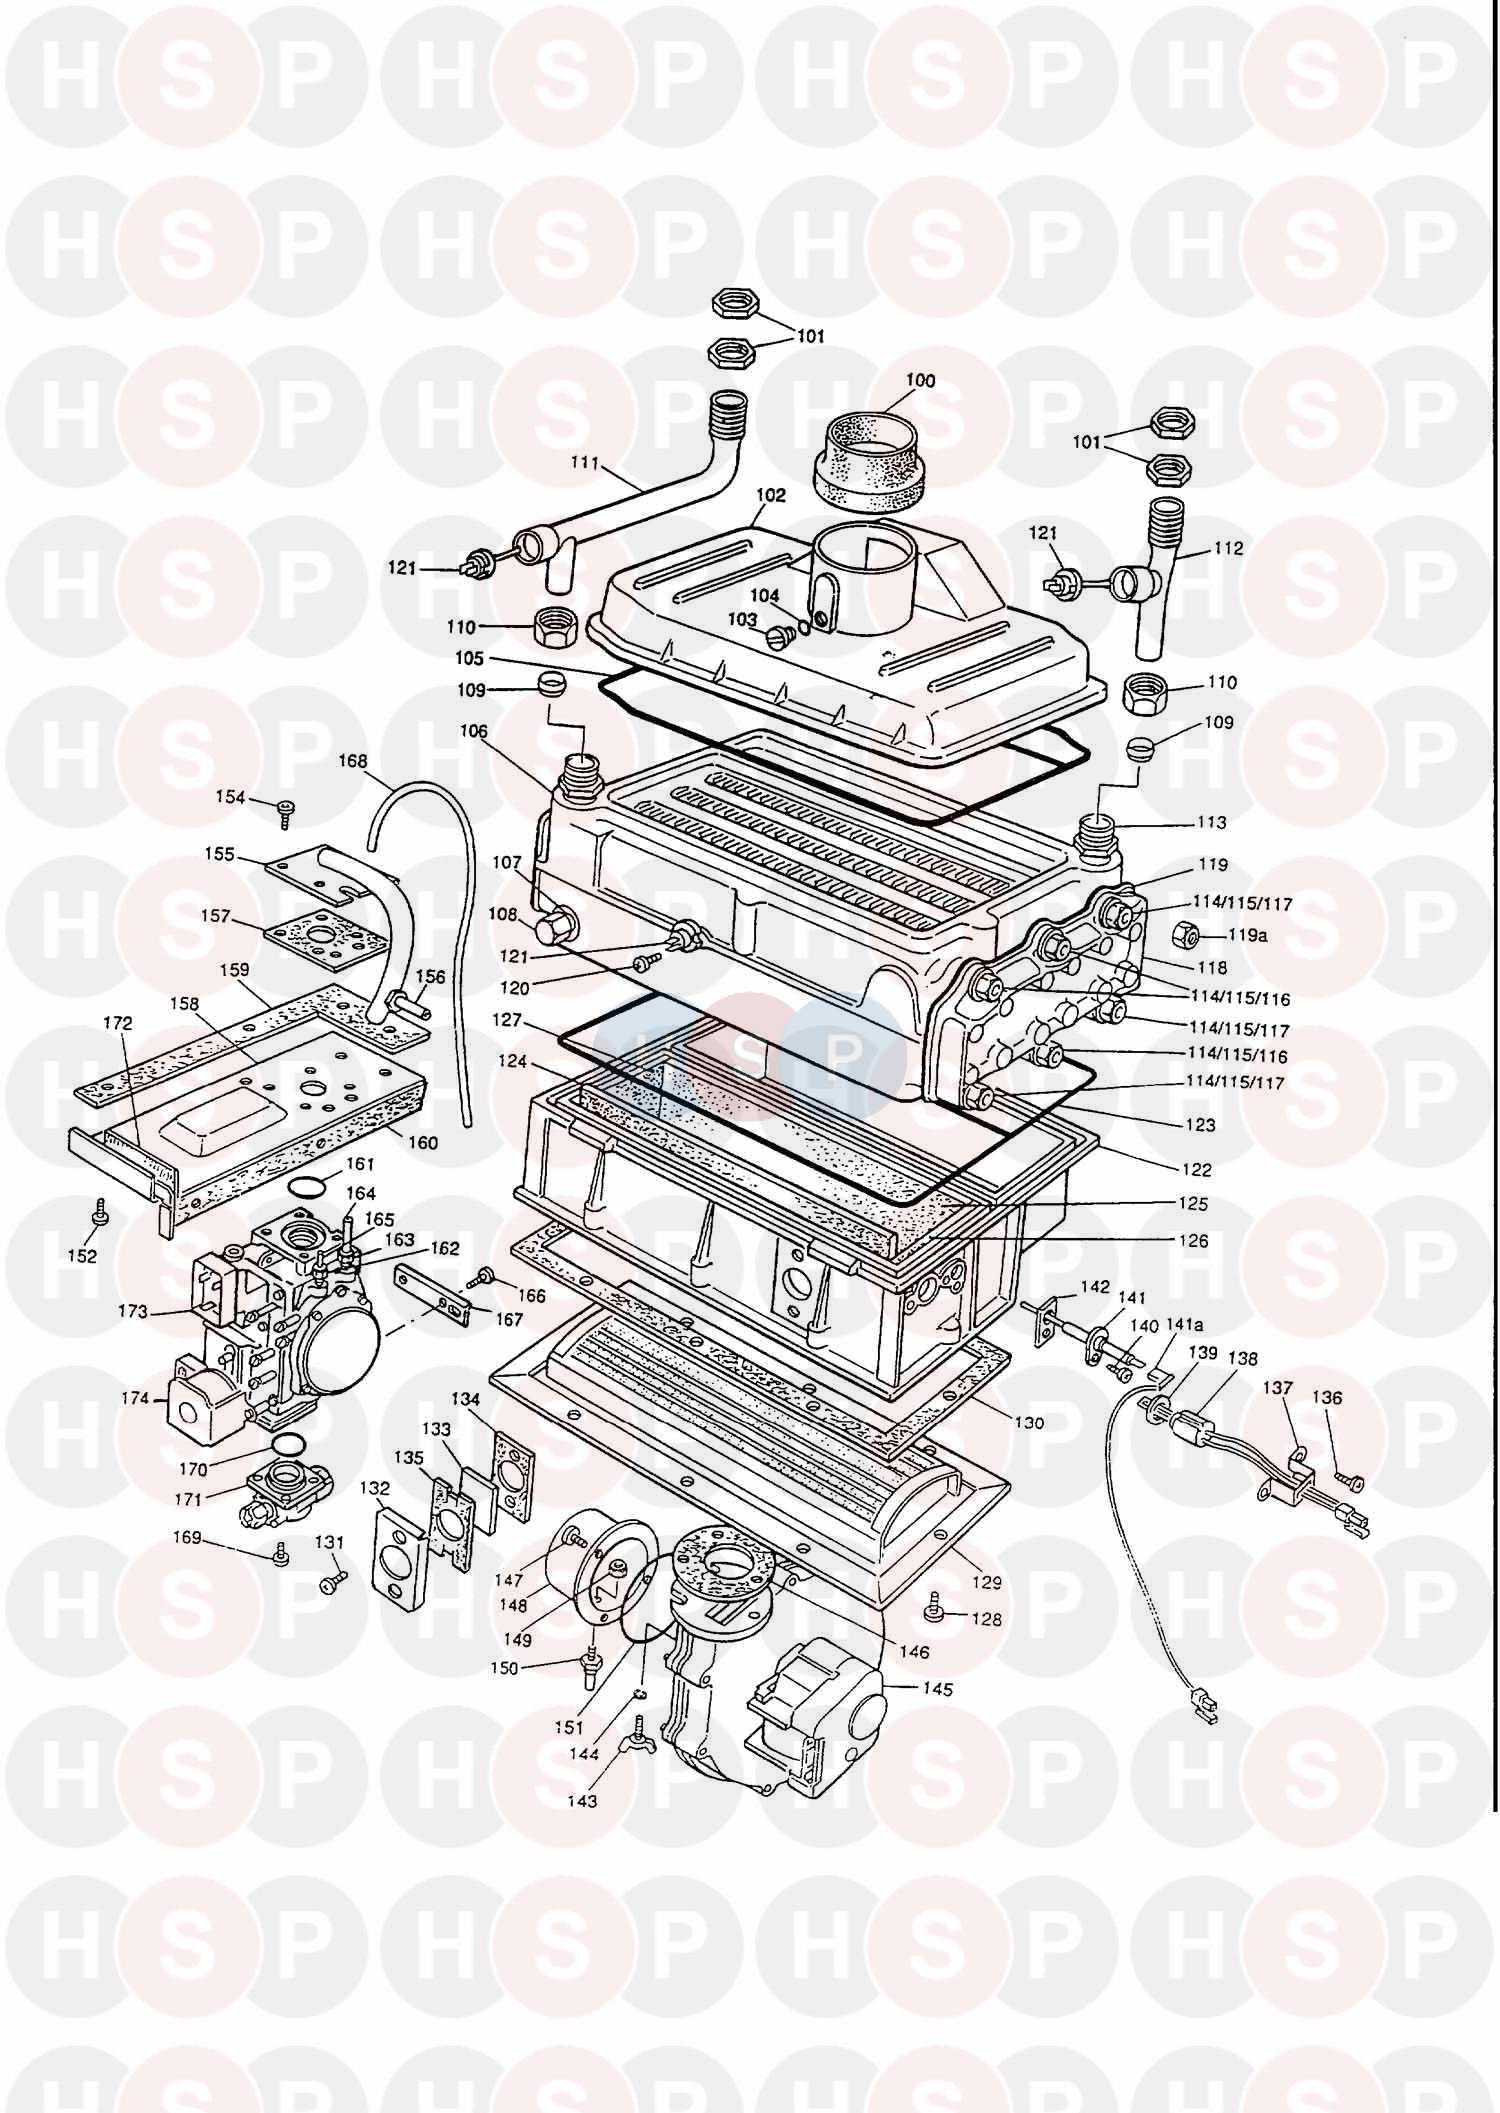 Potterton ENVOY 60 Appliance Diagram (ASSEMBLY 1